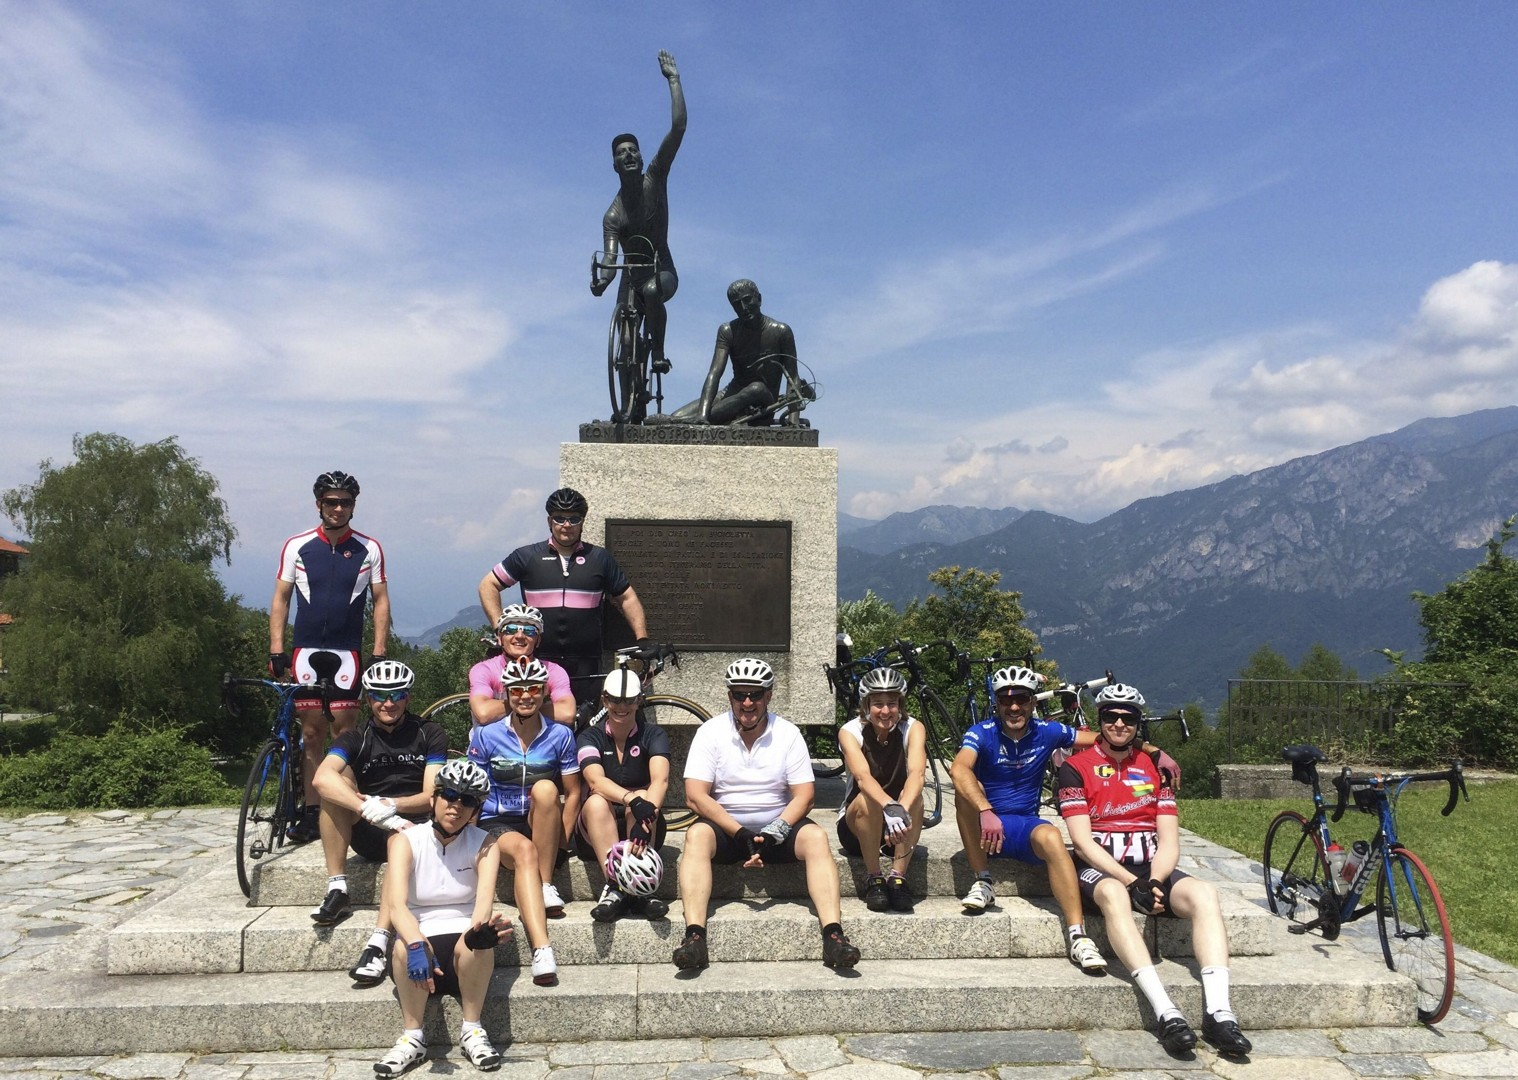 lombardia13.jpg - Italy - Lakes of Lombardia - Guided Road Cycling Holiday - Road Cycling